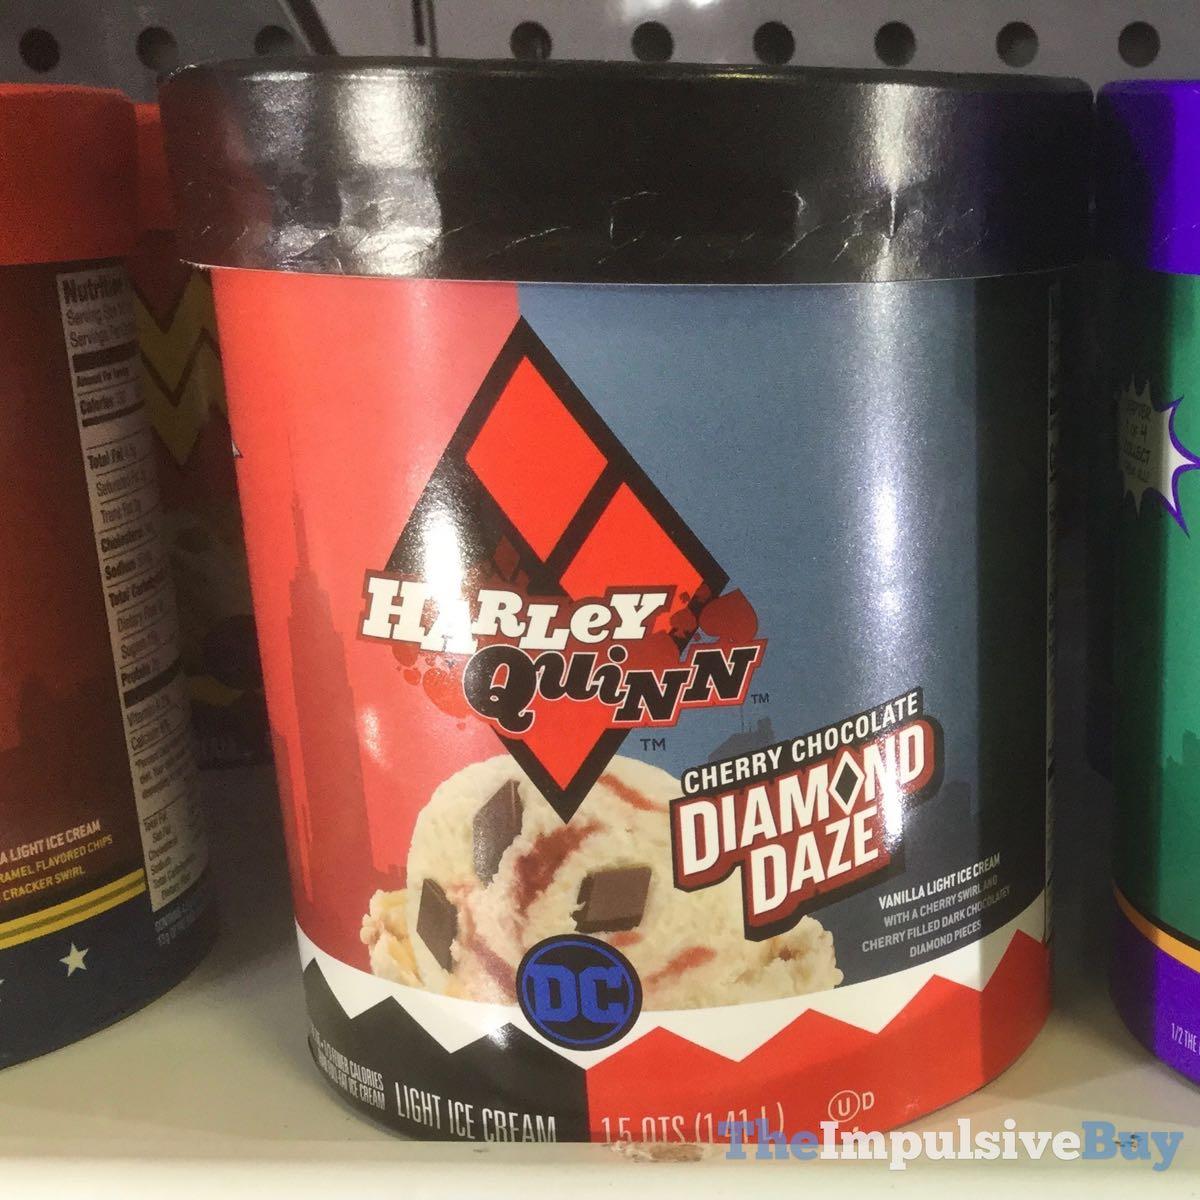 SPOTTED: Edy's-Dreyer's DC Villains Ice Cream - The Impulsive Buy